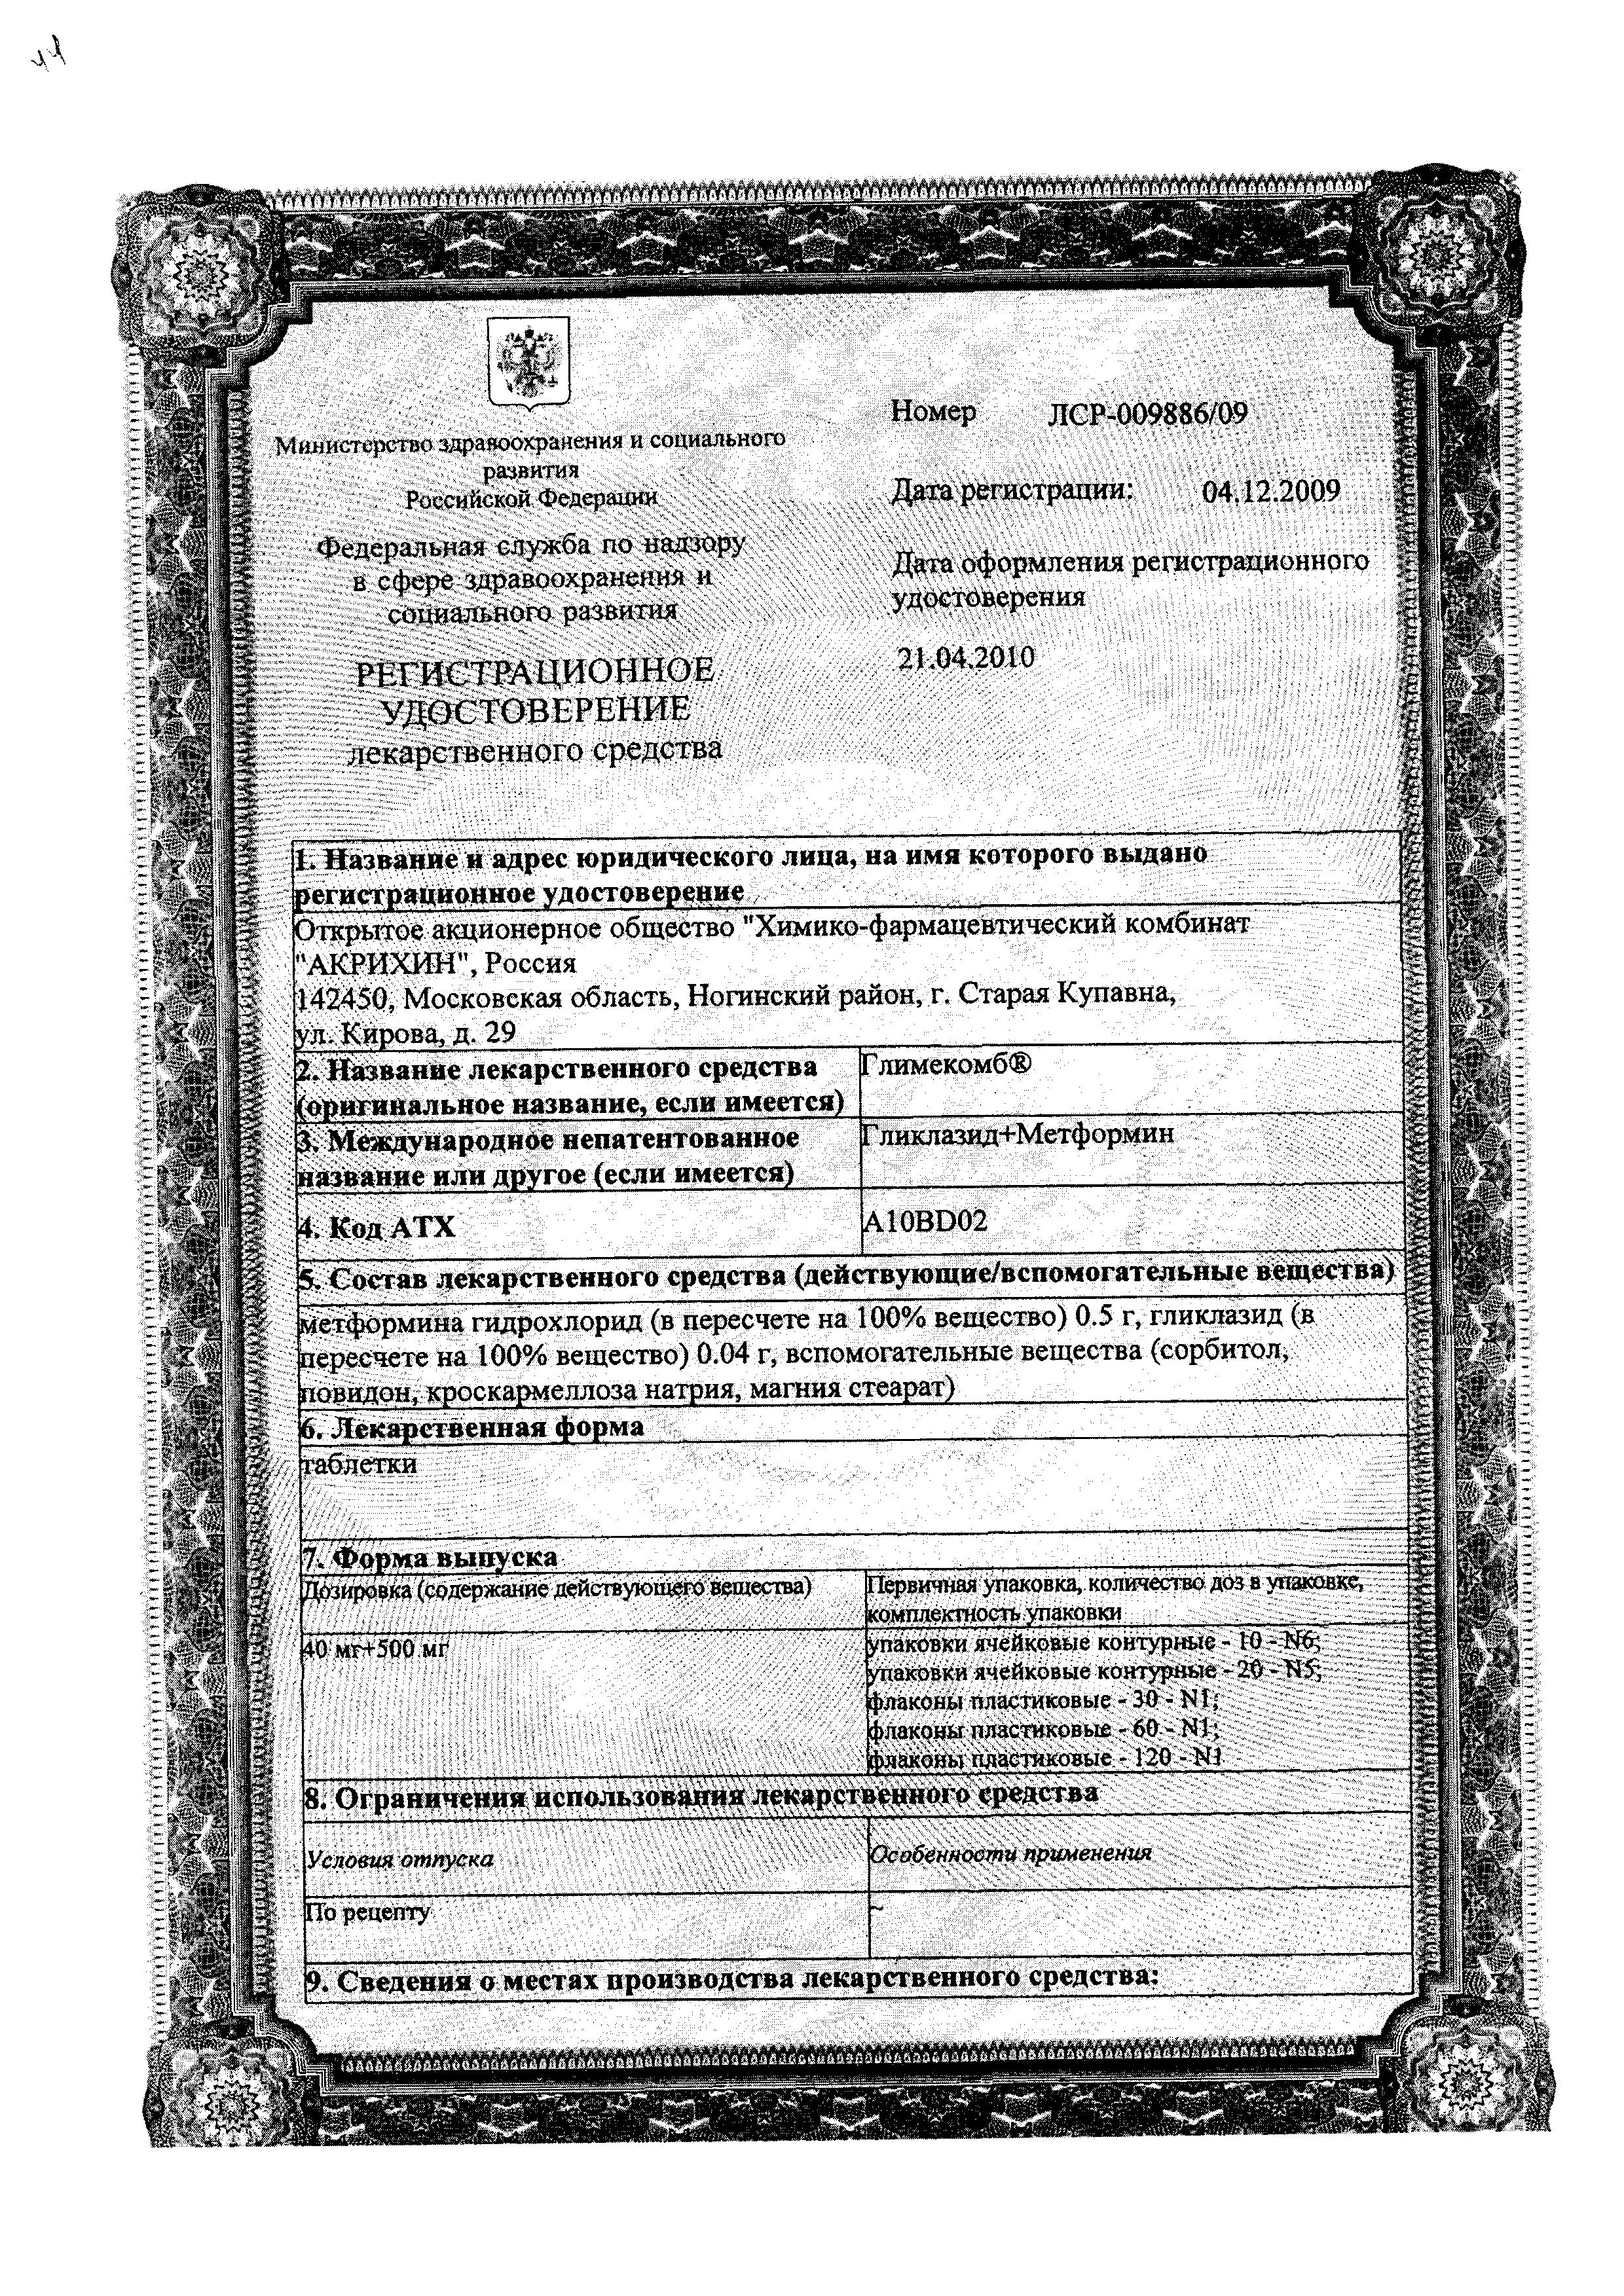 Глимекомб сертификат